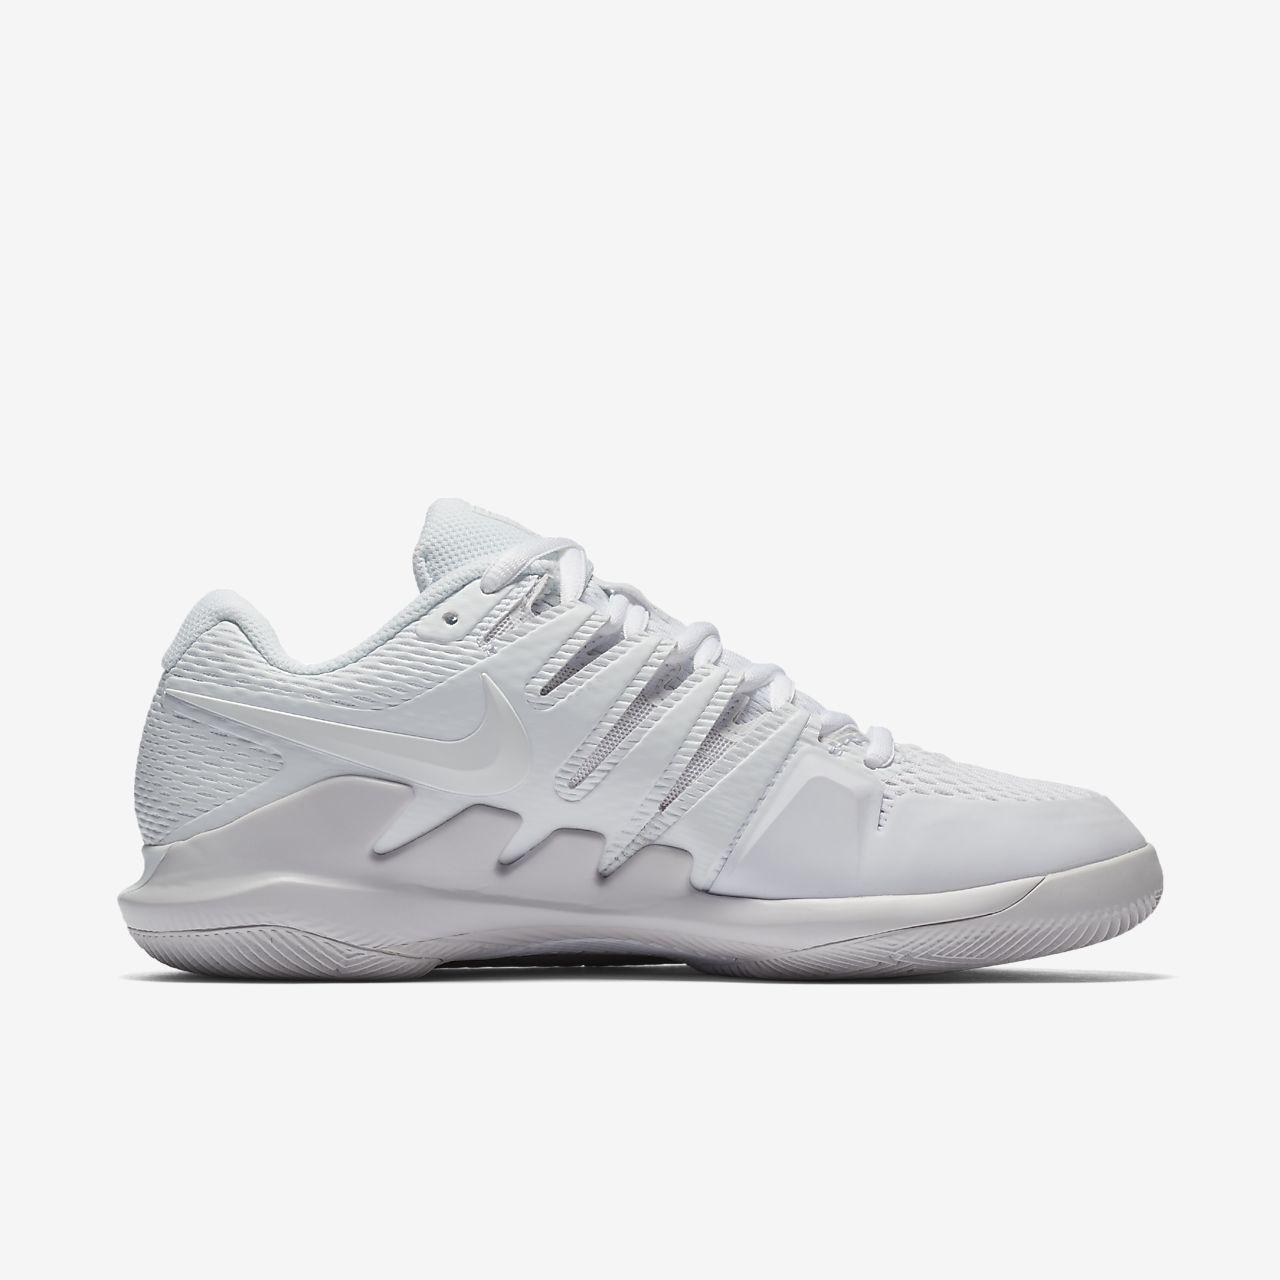 nikecourt air zoom vapor x hc womens tennis shoe